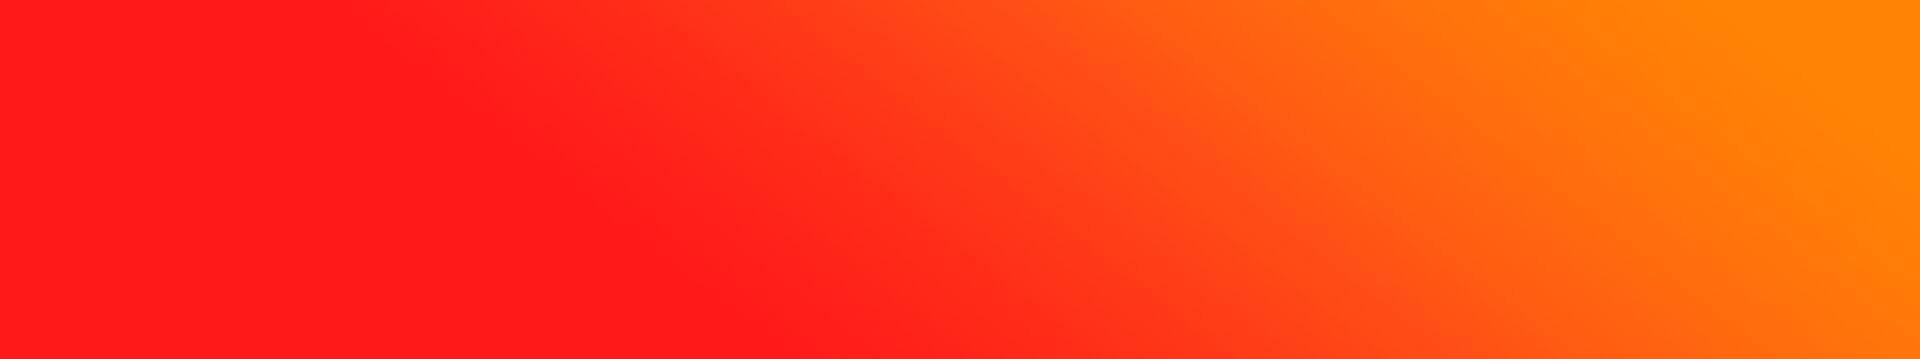 402021 - generic - TC banner - MSS Fall 2021 - Step 1 - IMG